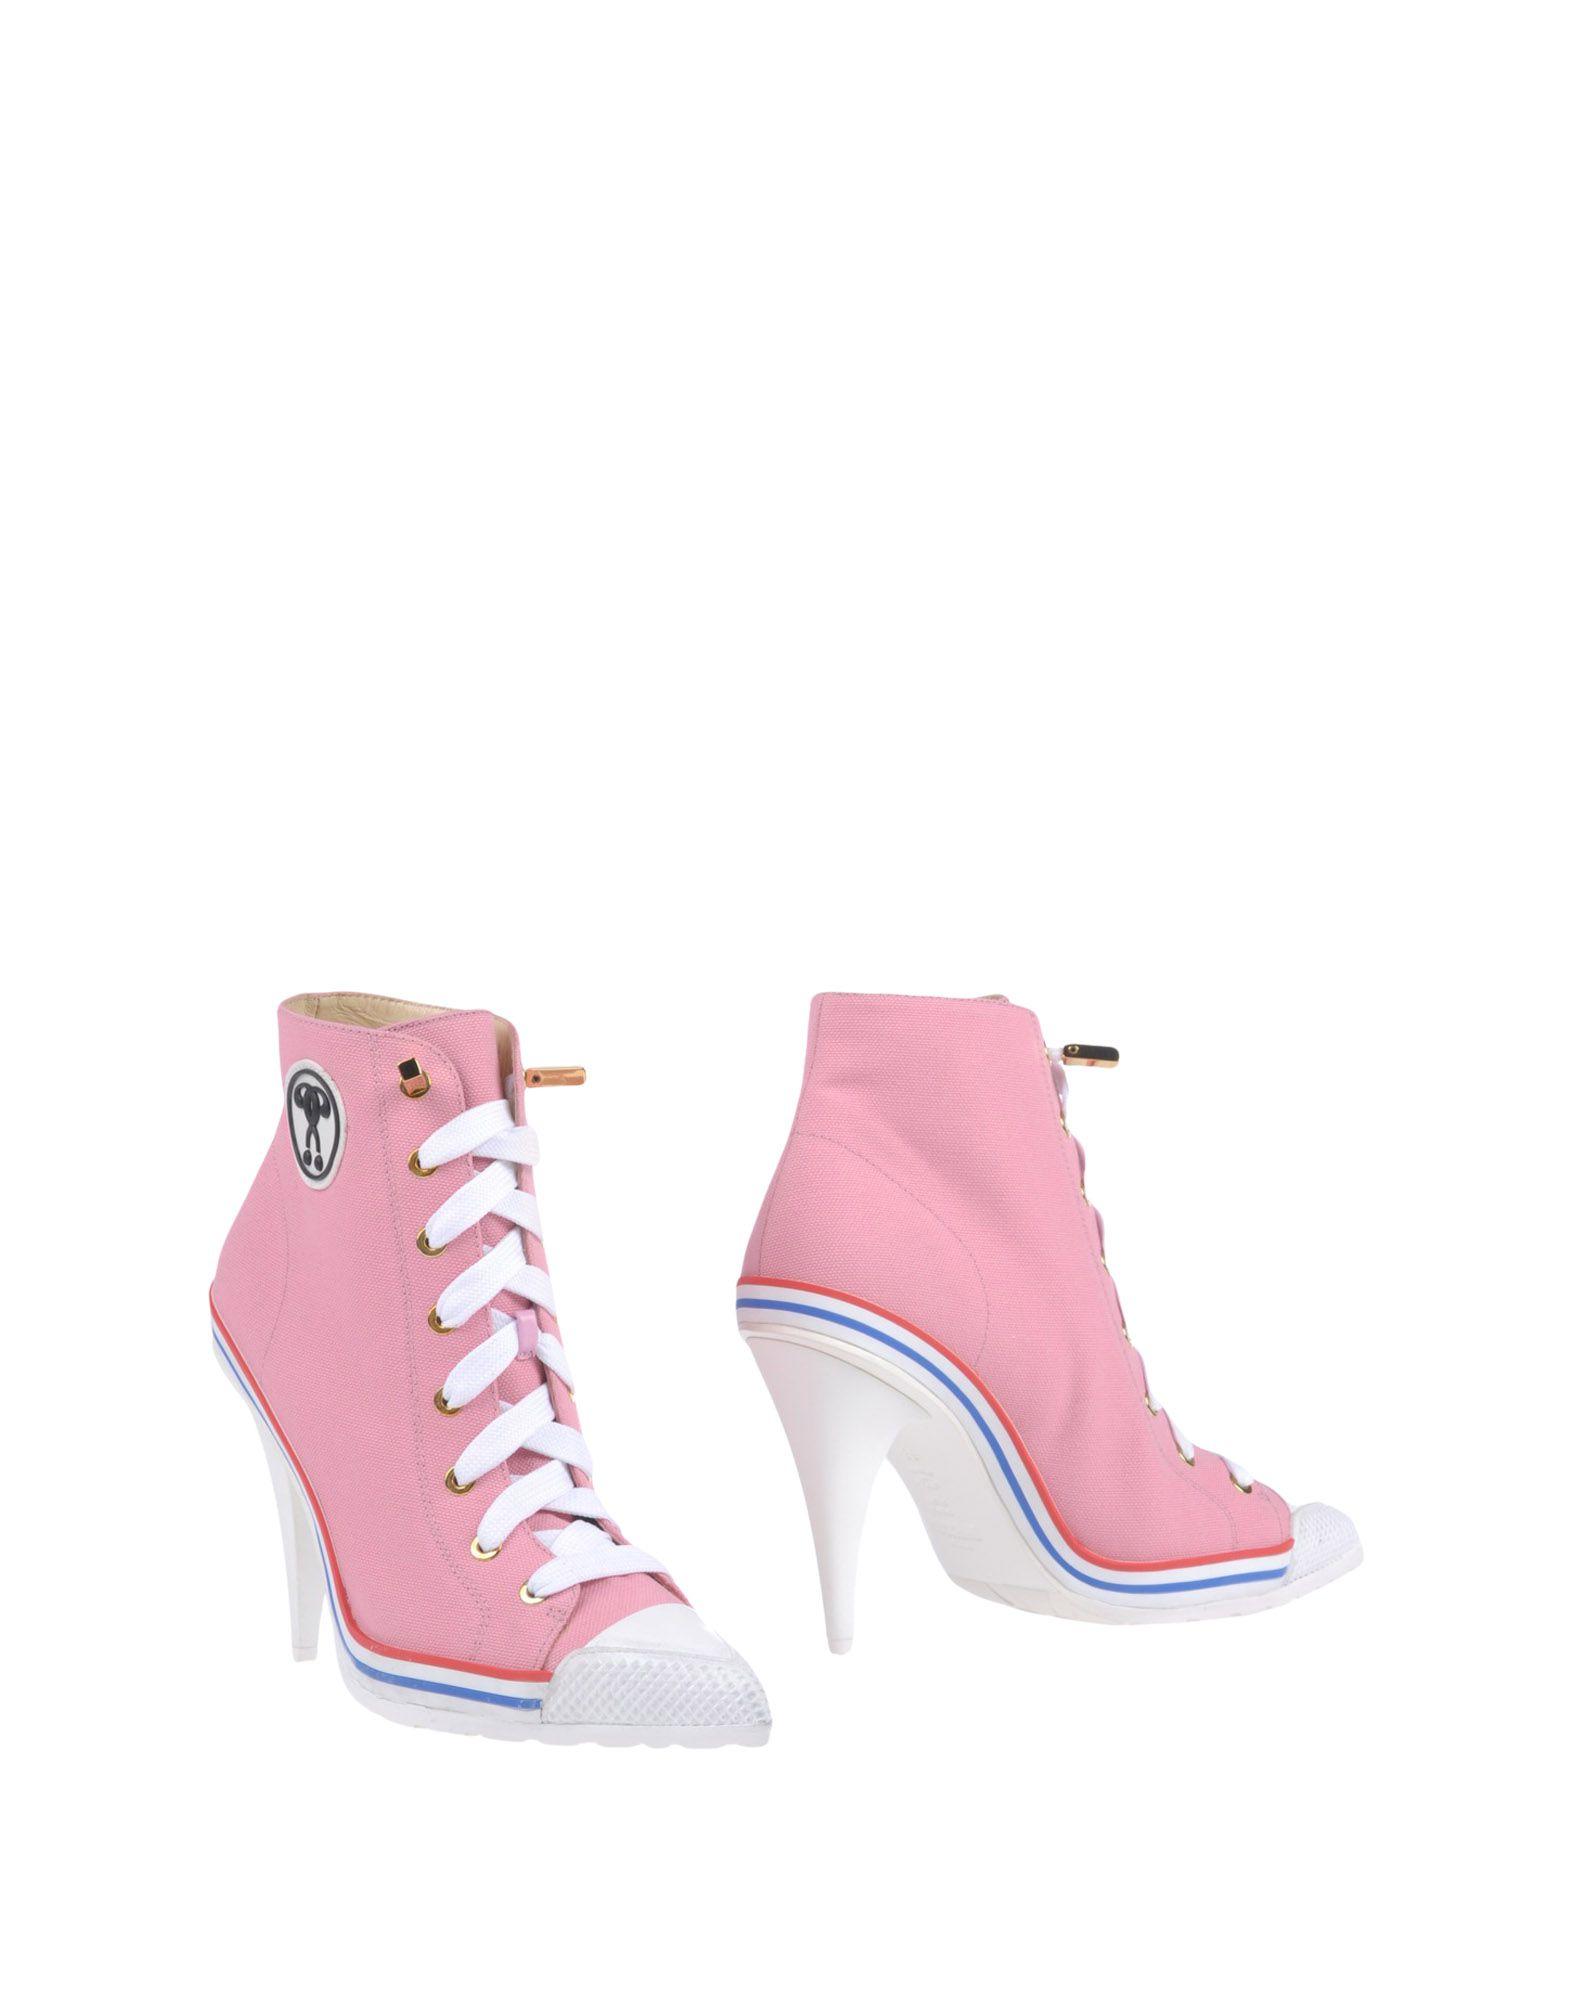 Moda Stivaletti Moschino Donna - 11383993OK 11383993OK - 8f0fc7